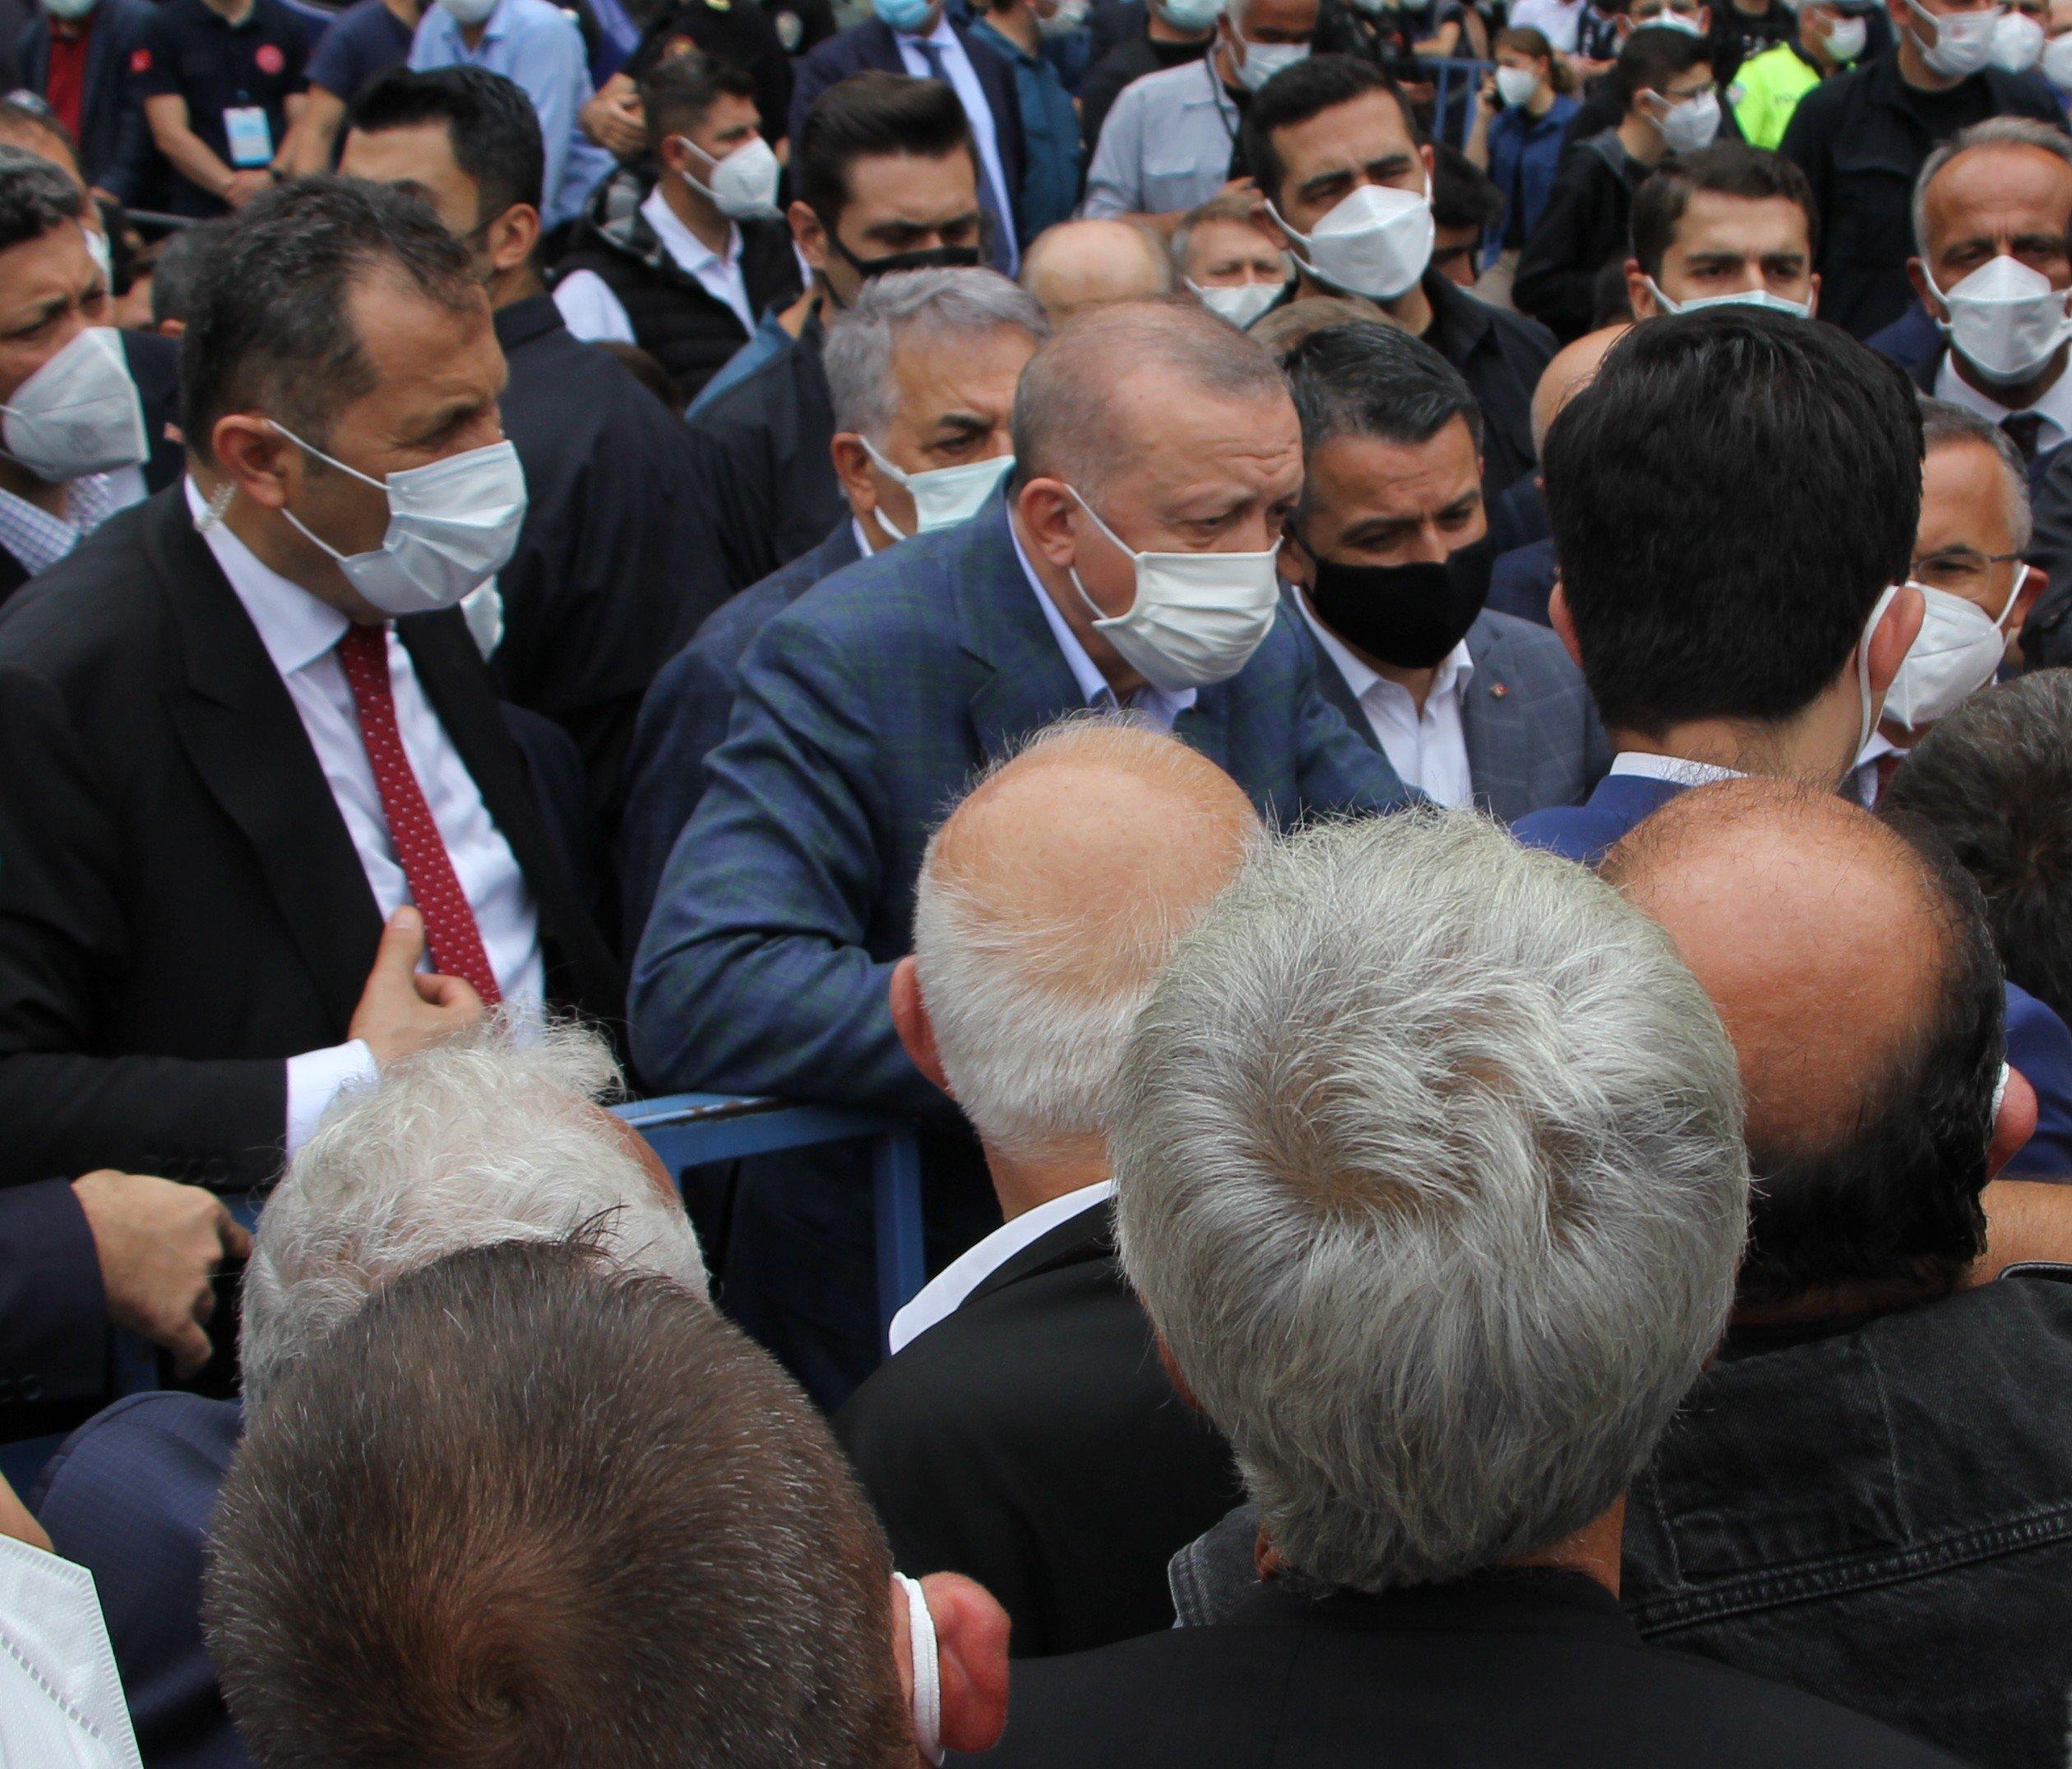 President Recep Tayyip Erdoğan speaks with locals in the Güneysu district, in Rize, northern Turkey, July 23, 2021. (İHA PHOTO)